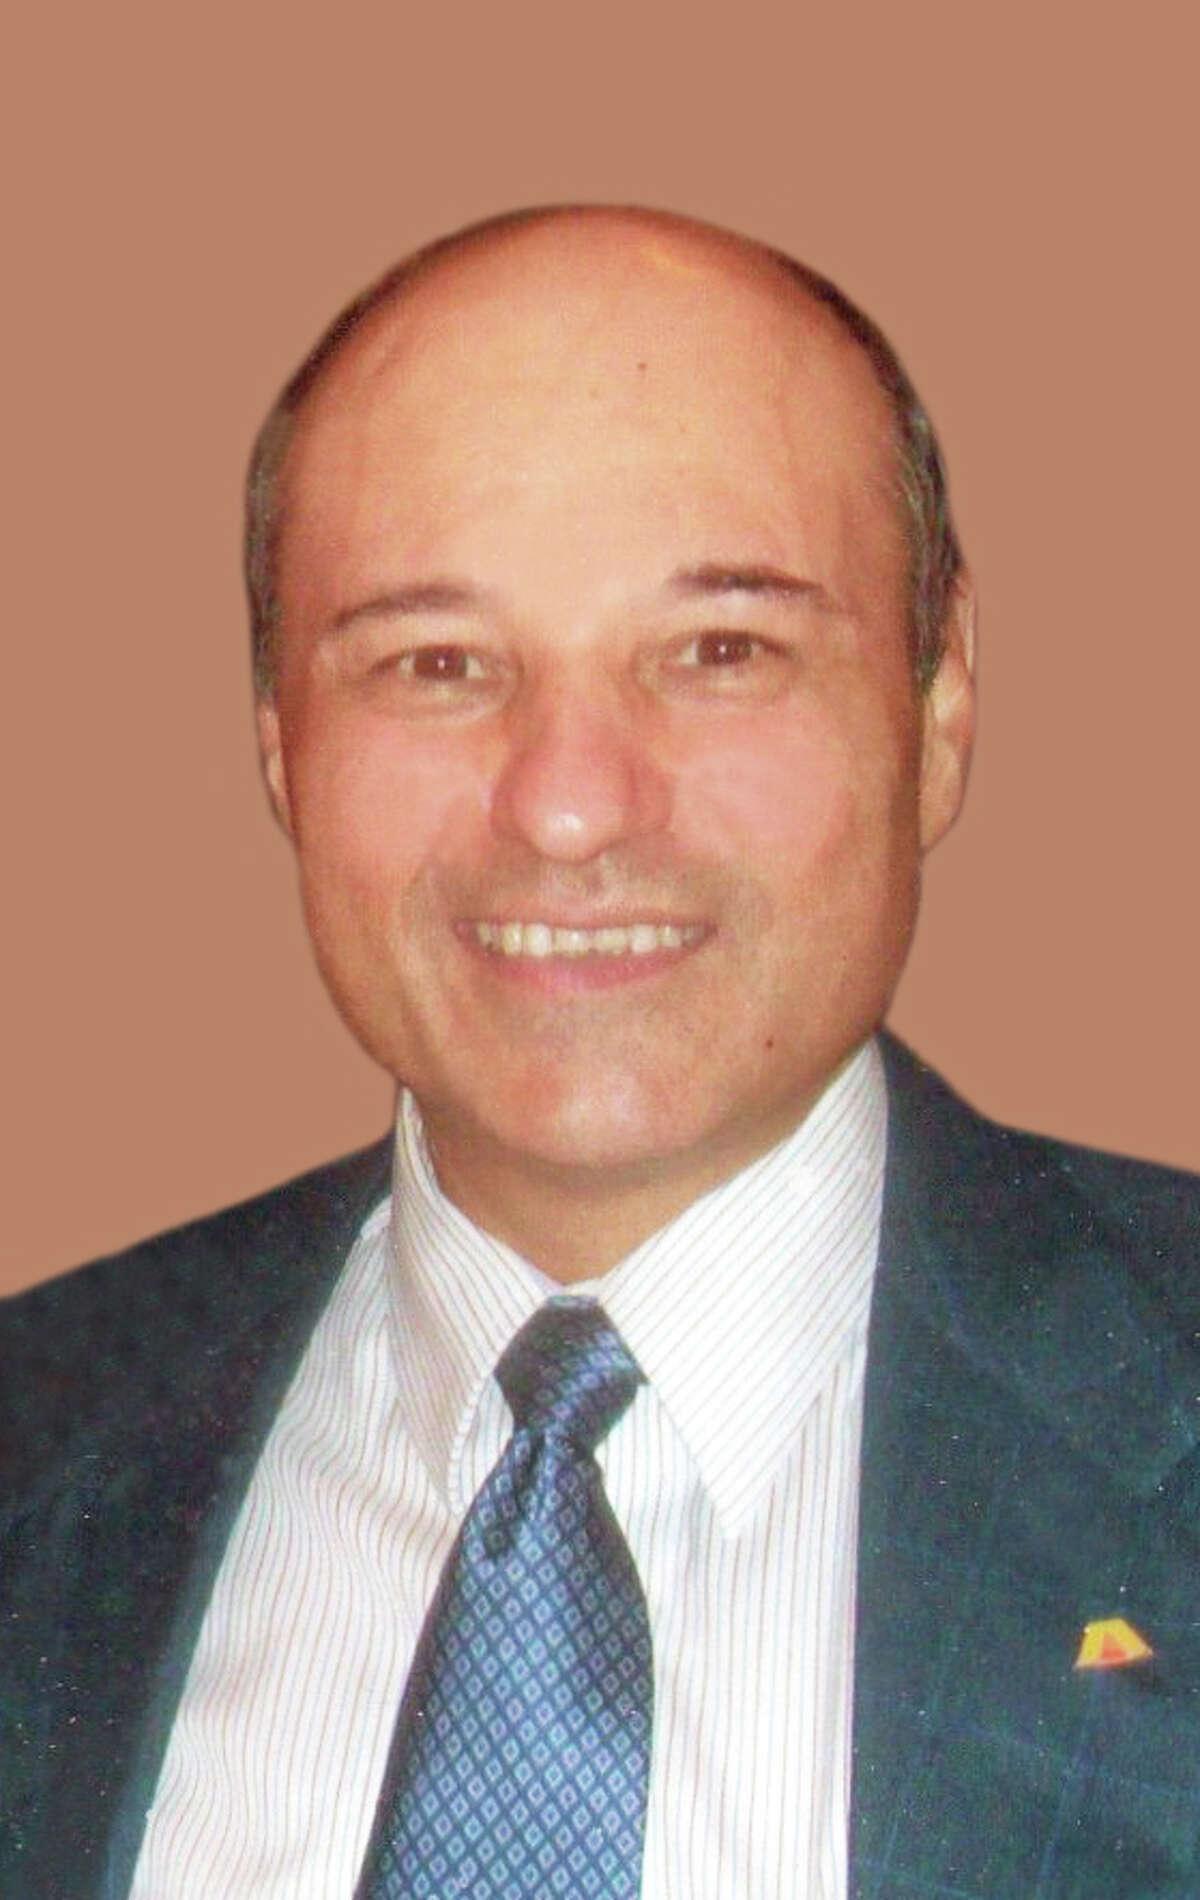 Jorge David Cedillo